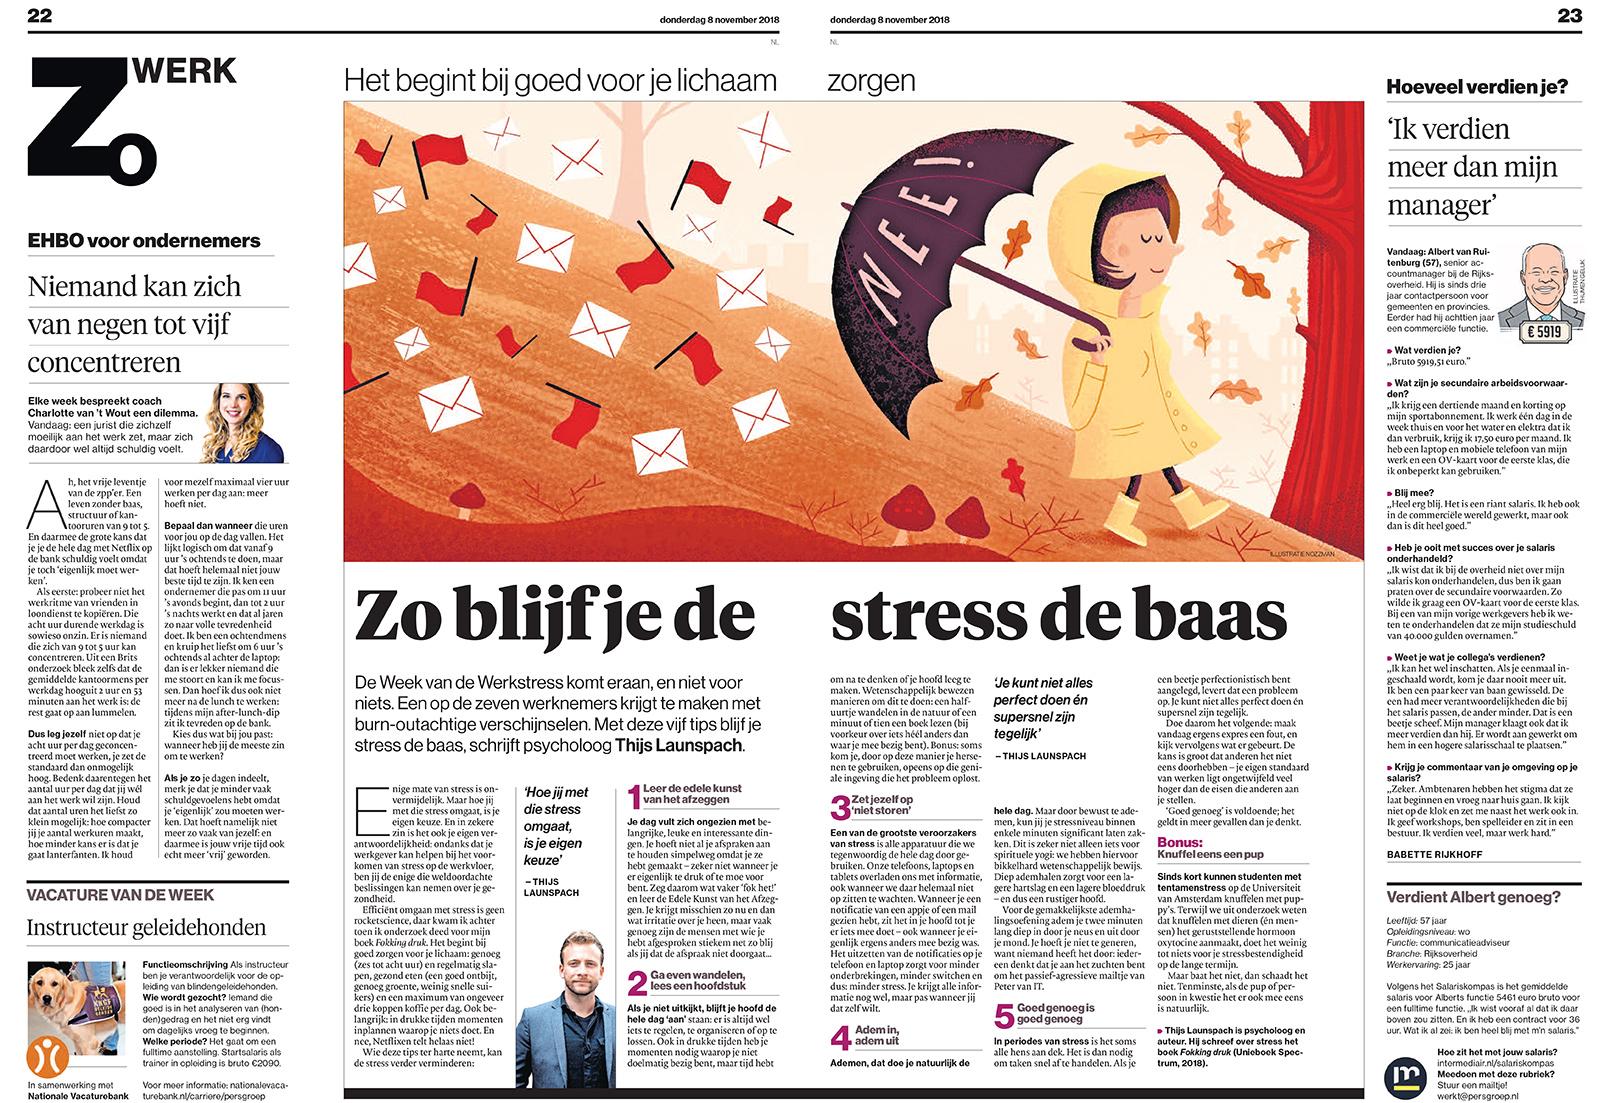 20181107 stress krant